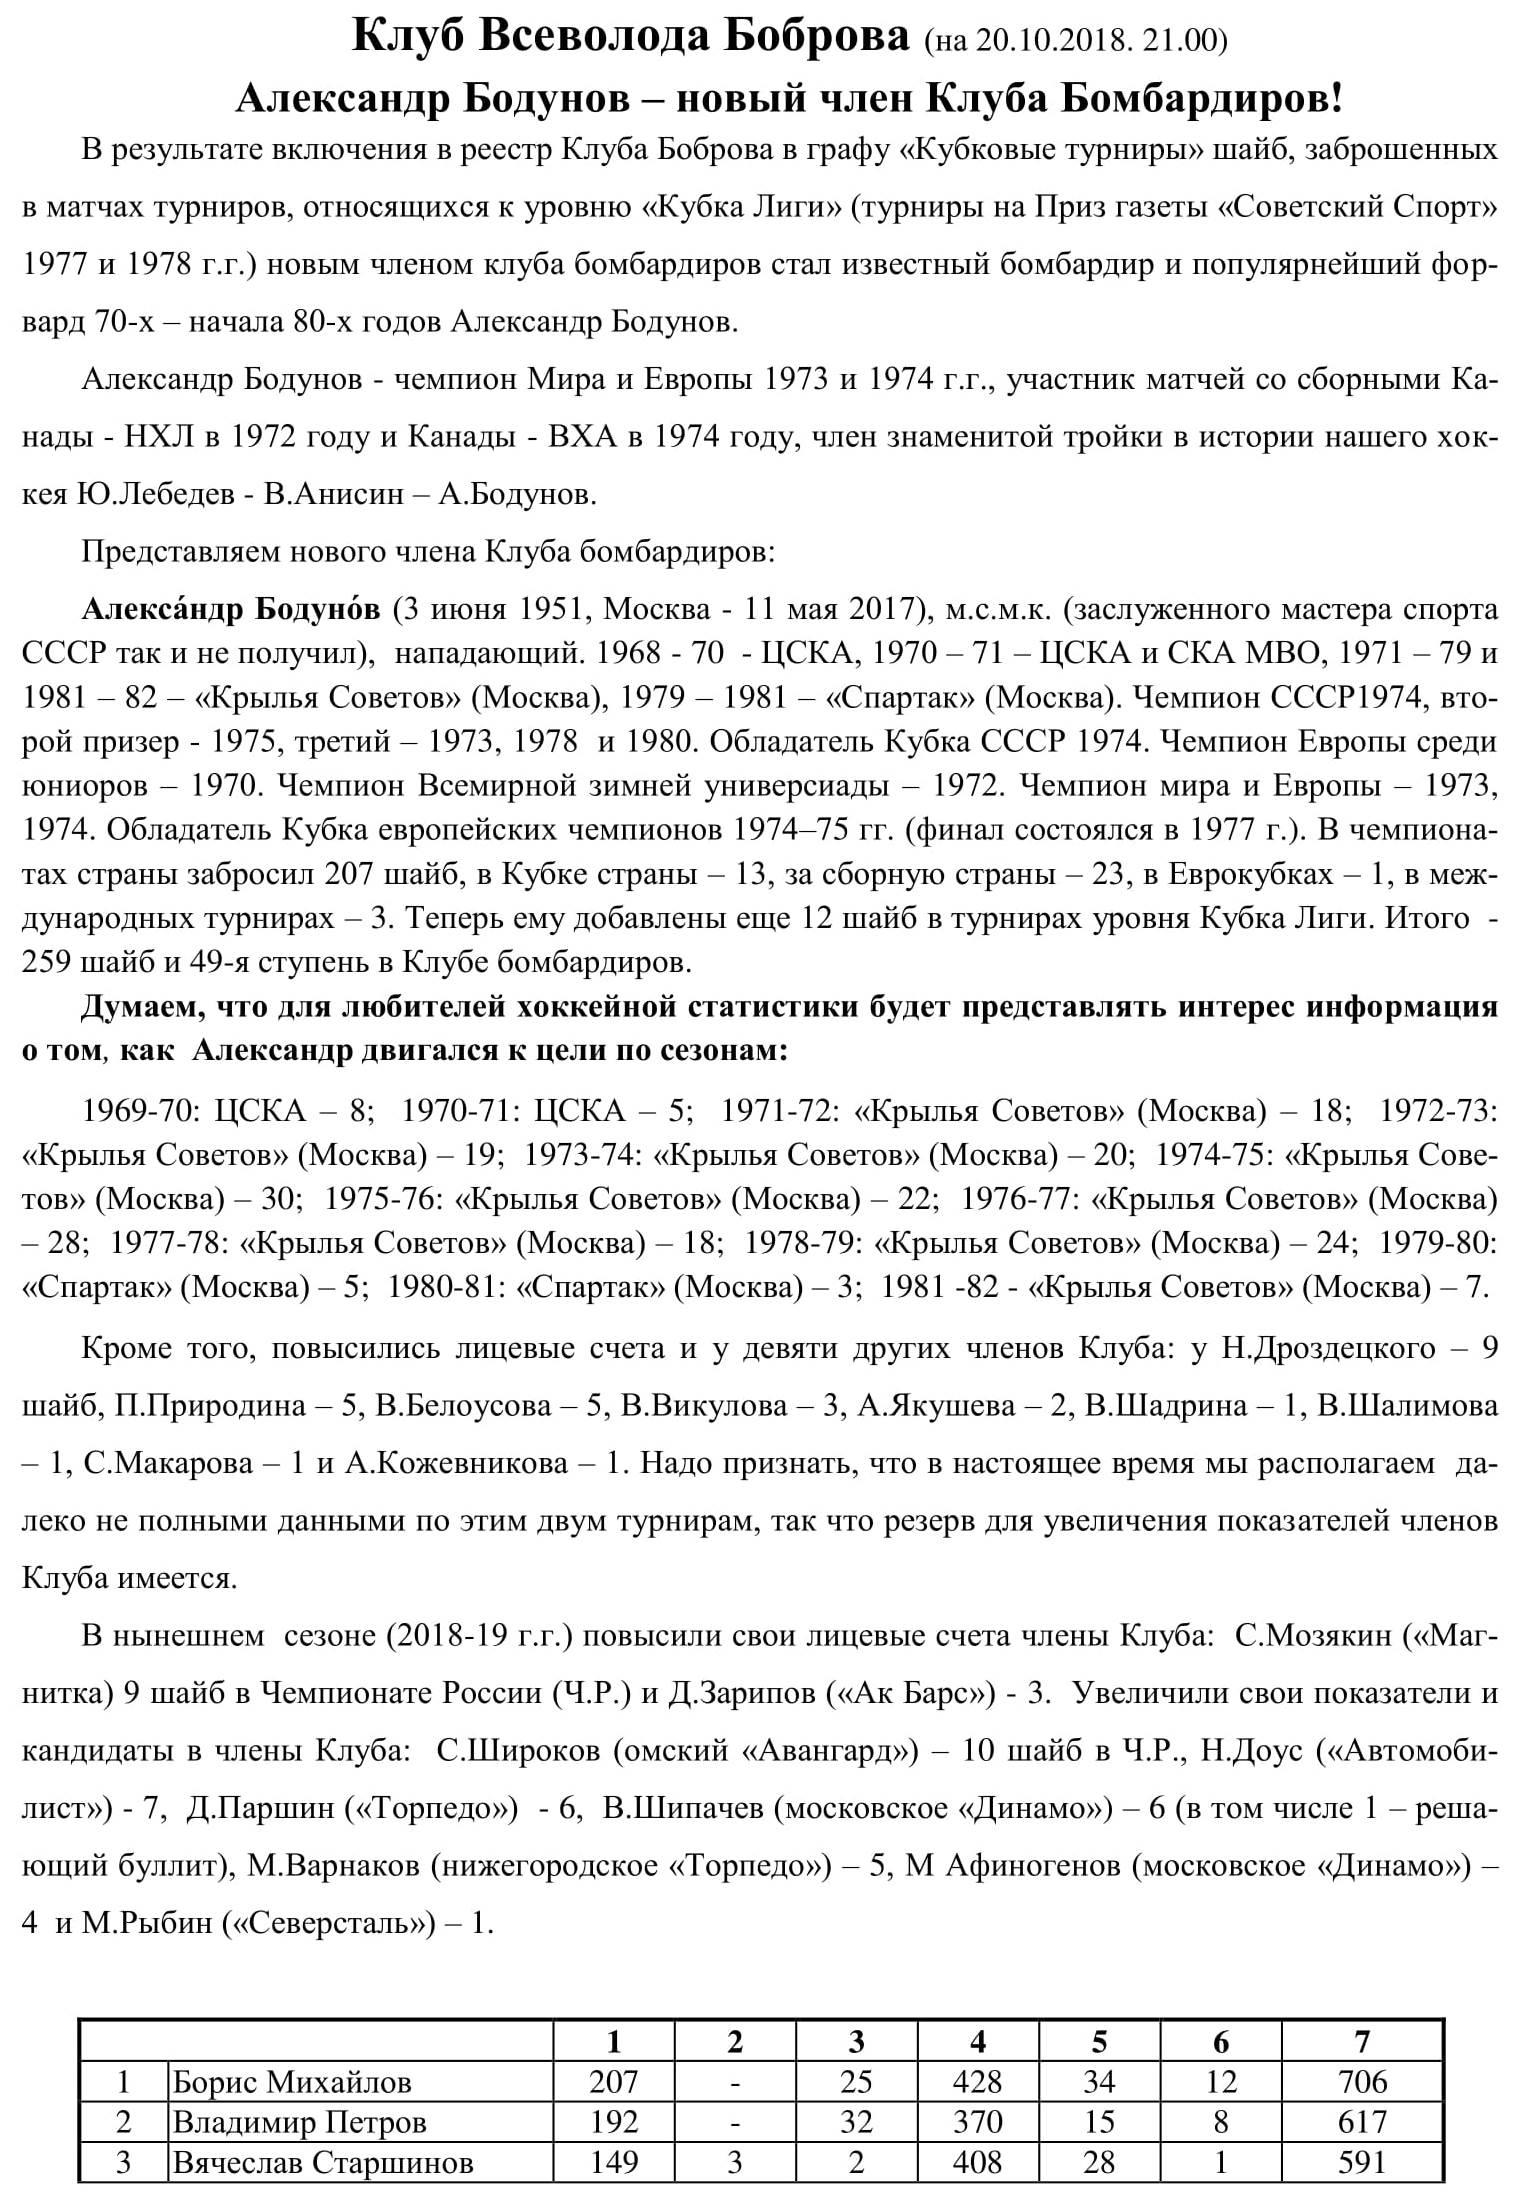 Клуб Всеволода Боброва 2018-19-1.jpg